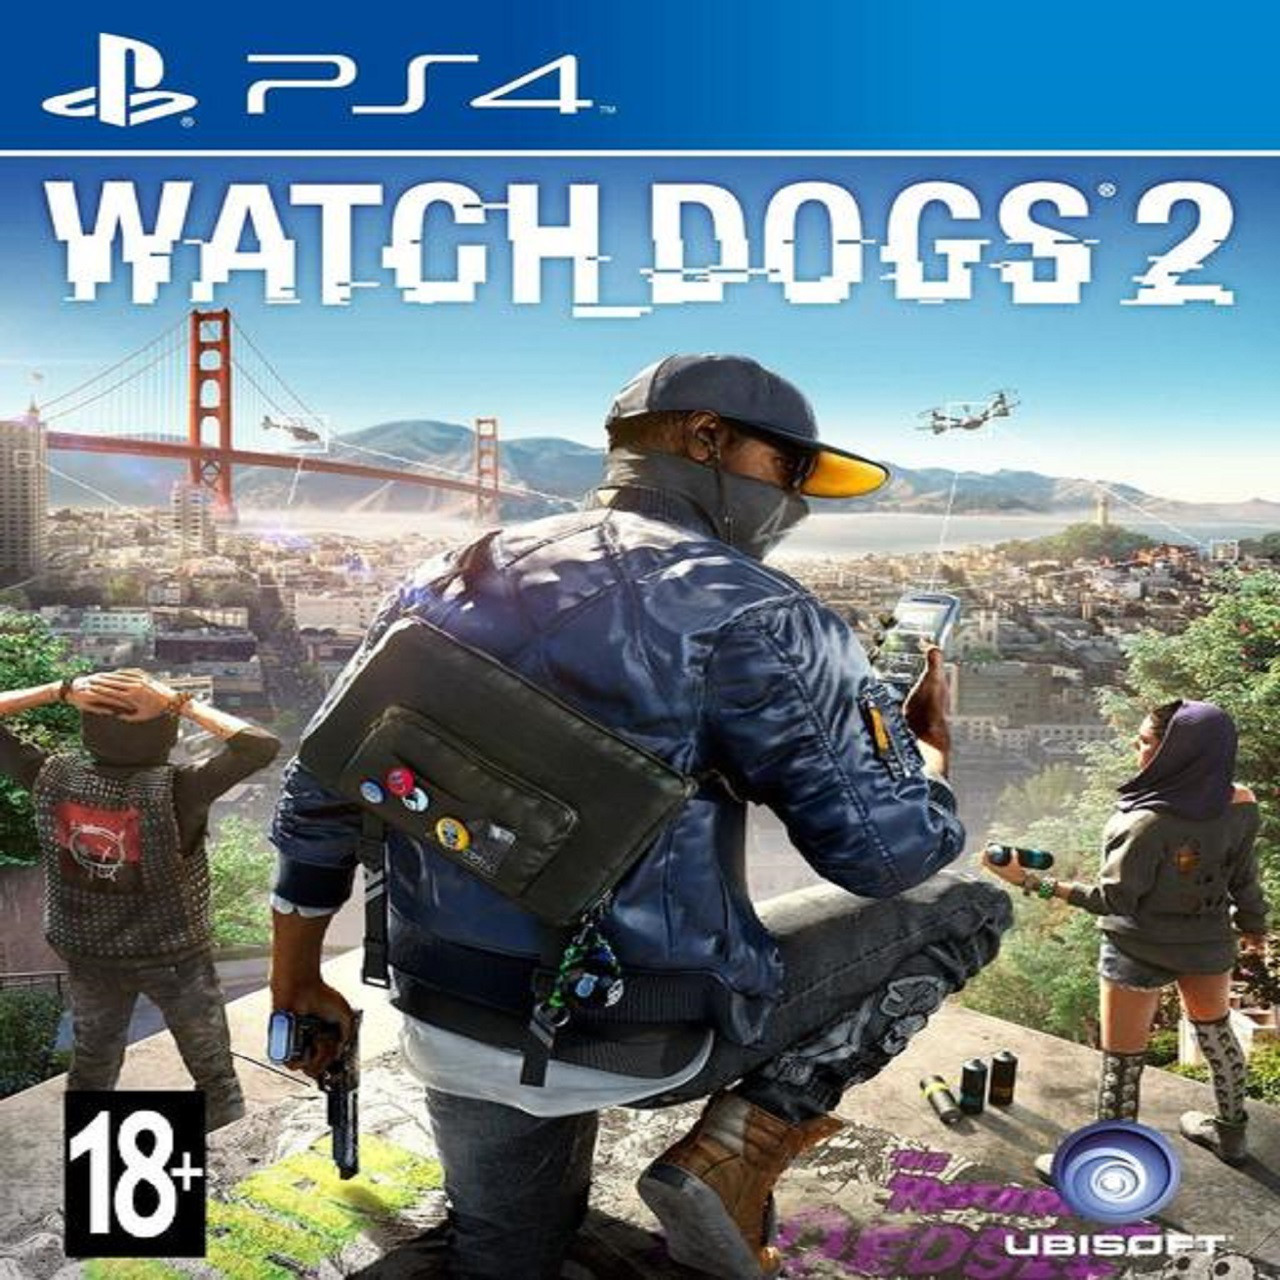 Watch Dogs 2 PS4 (английская версия) (Б/У)